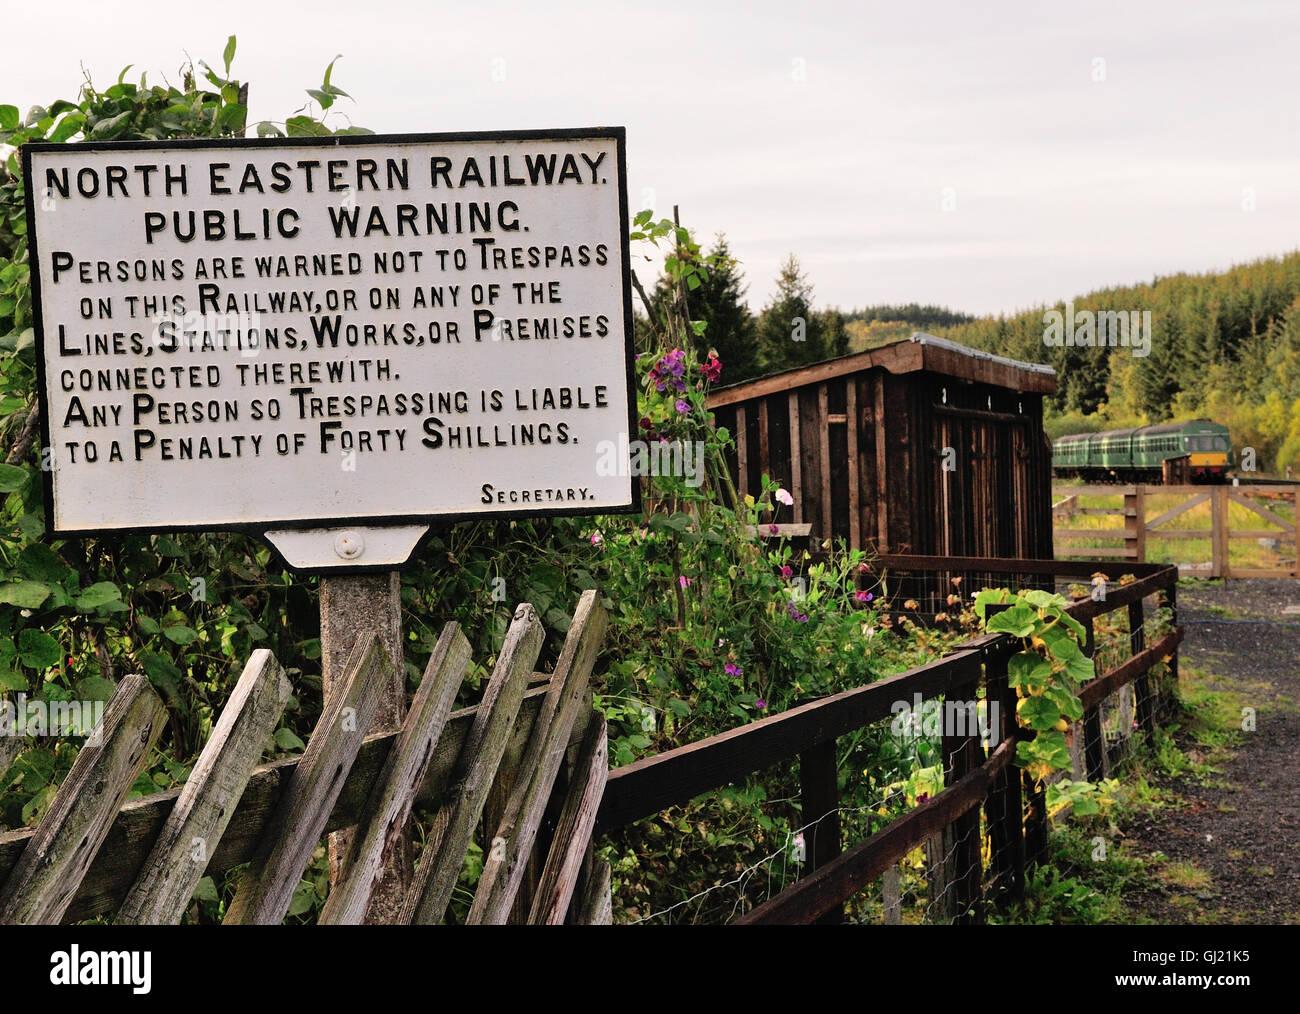 North Eastern Railway warning notice beside the North Yorkshire Moors Railway. - Stock Image